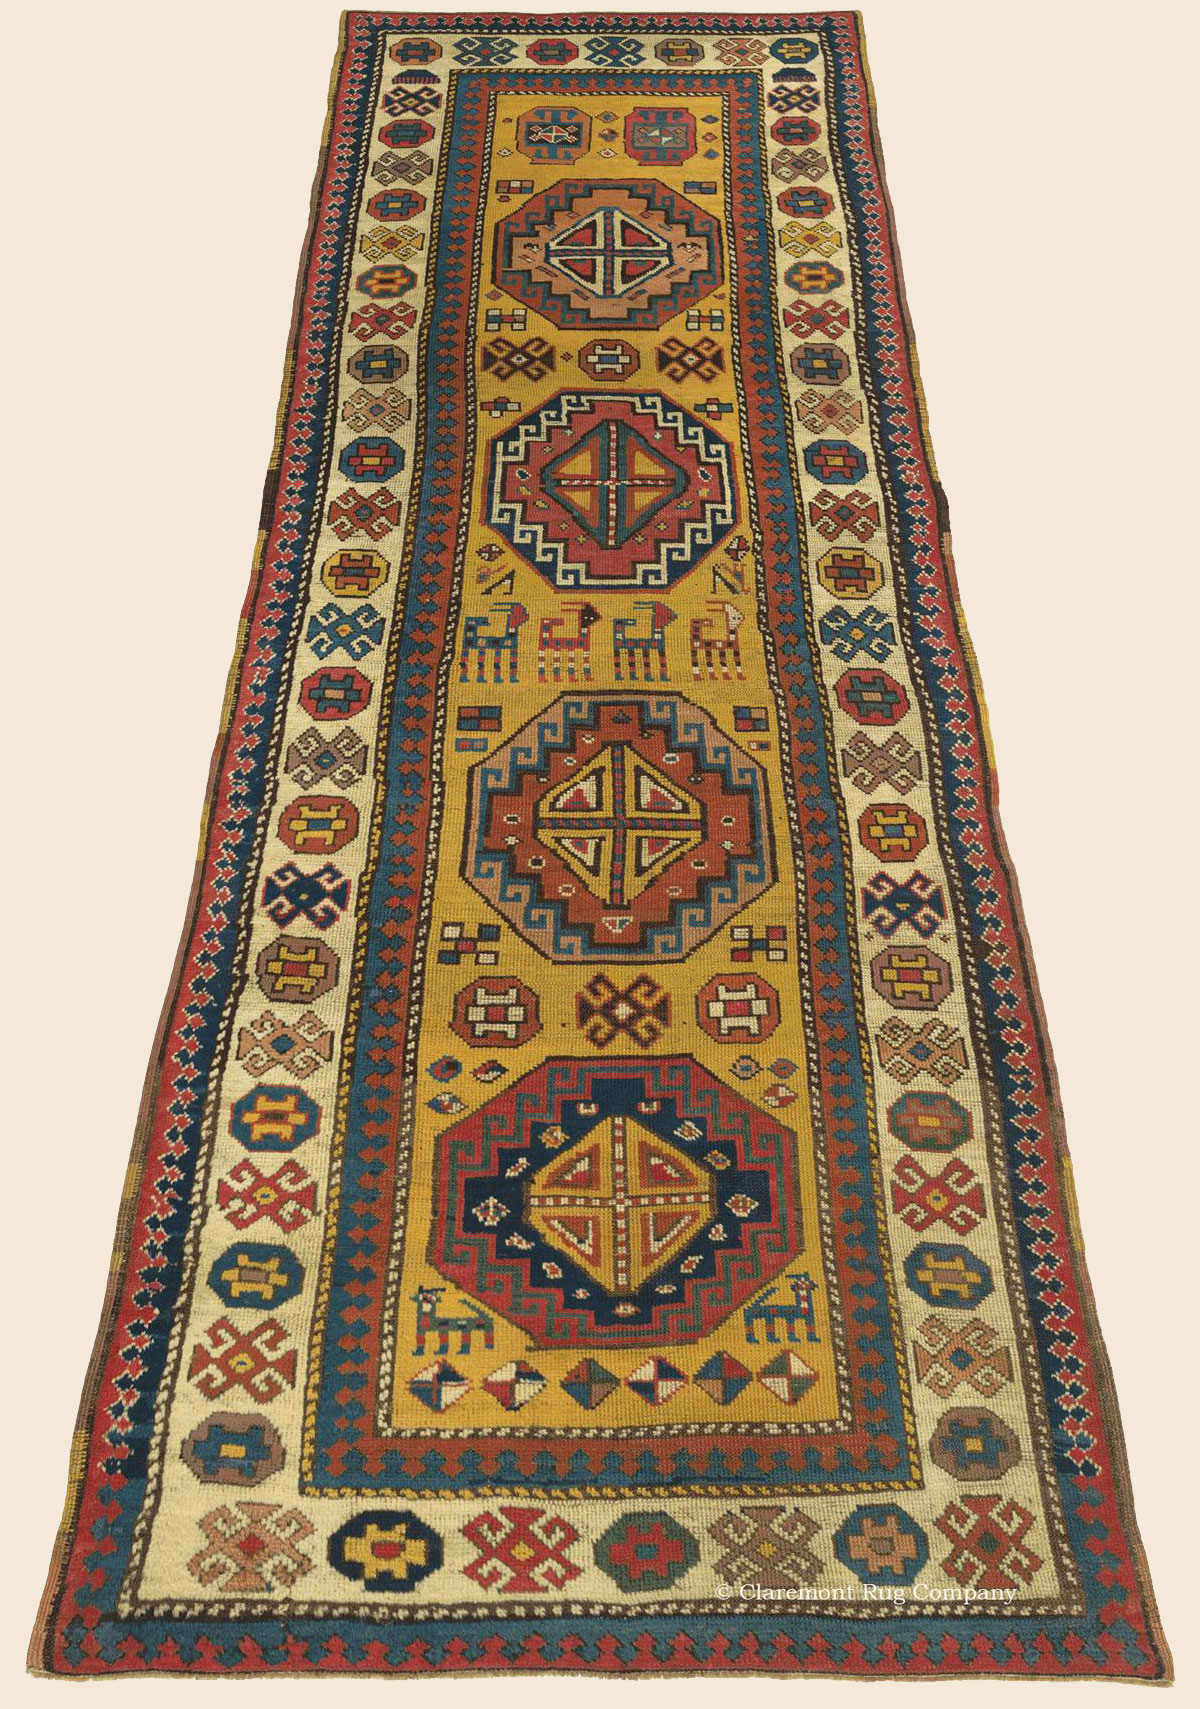 Kazak Runner Southern Central Caucasian Antique Rug Claremont Rug Company